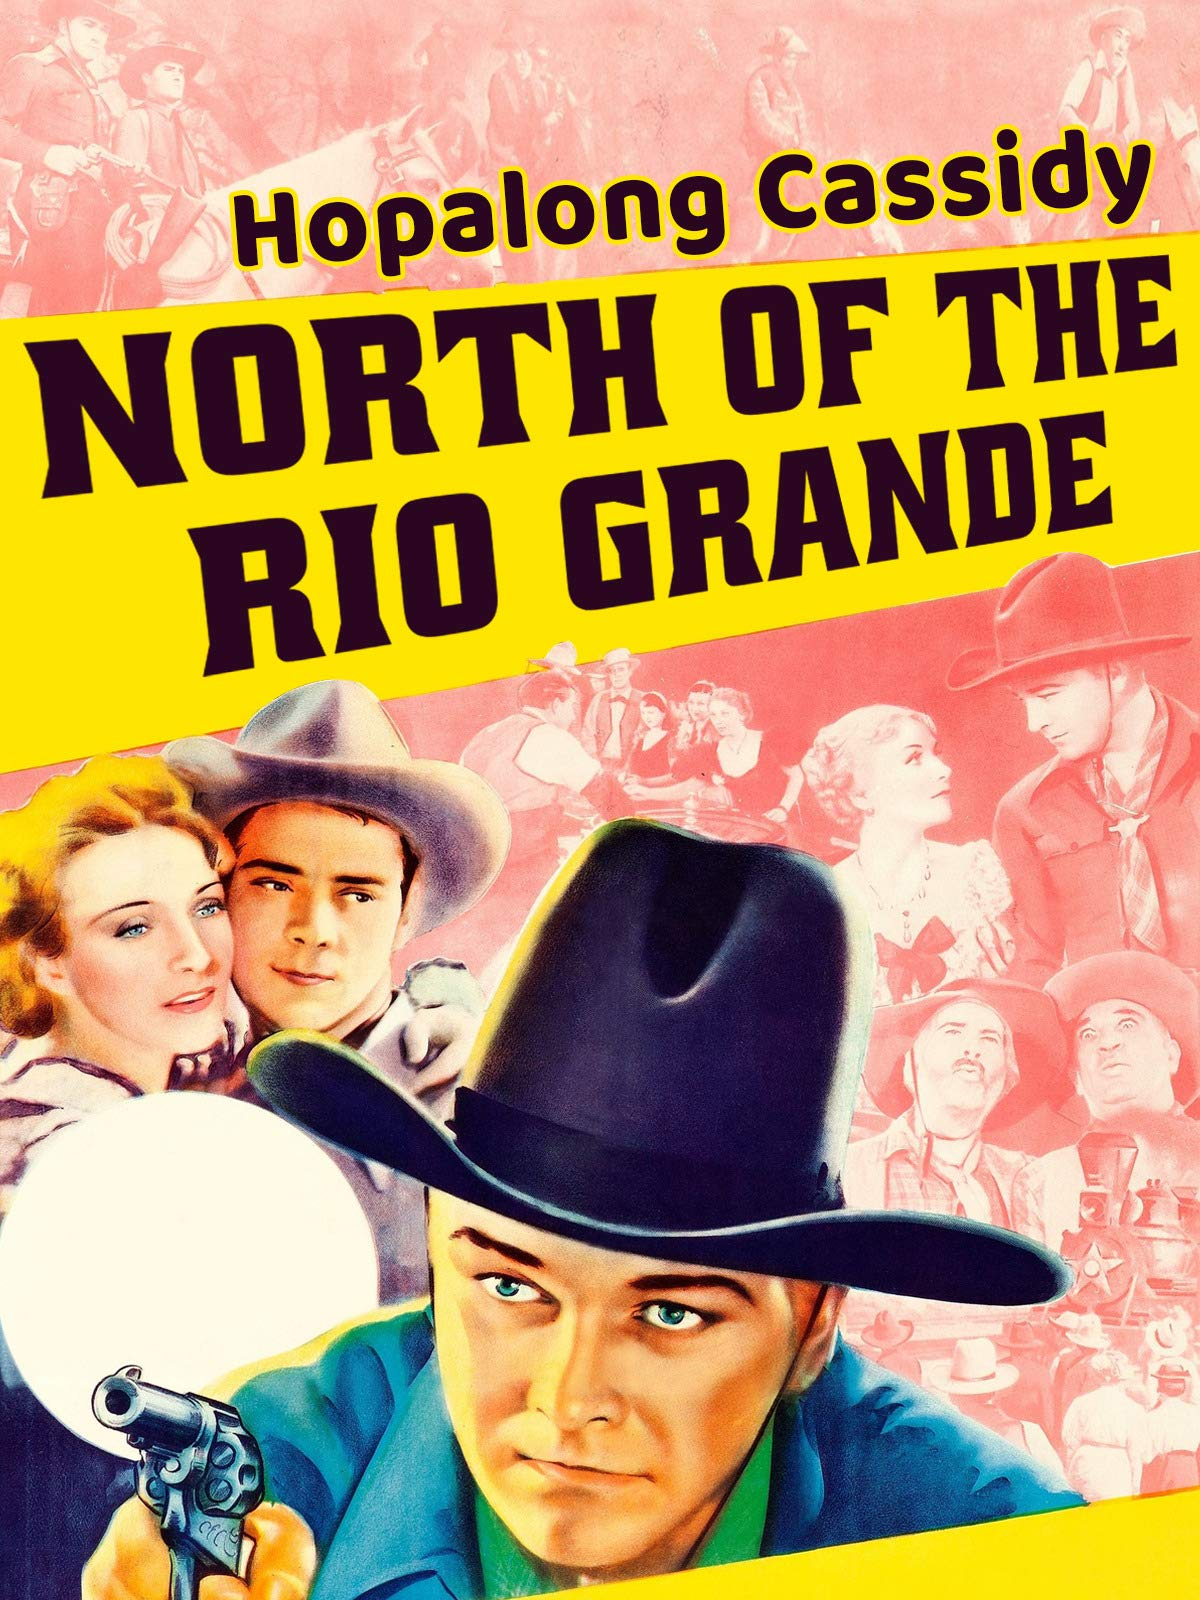 Hopalong Cassidy - North Of The Rio Grande